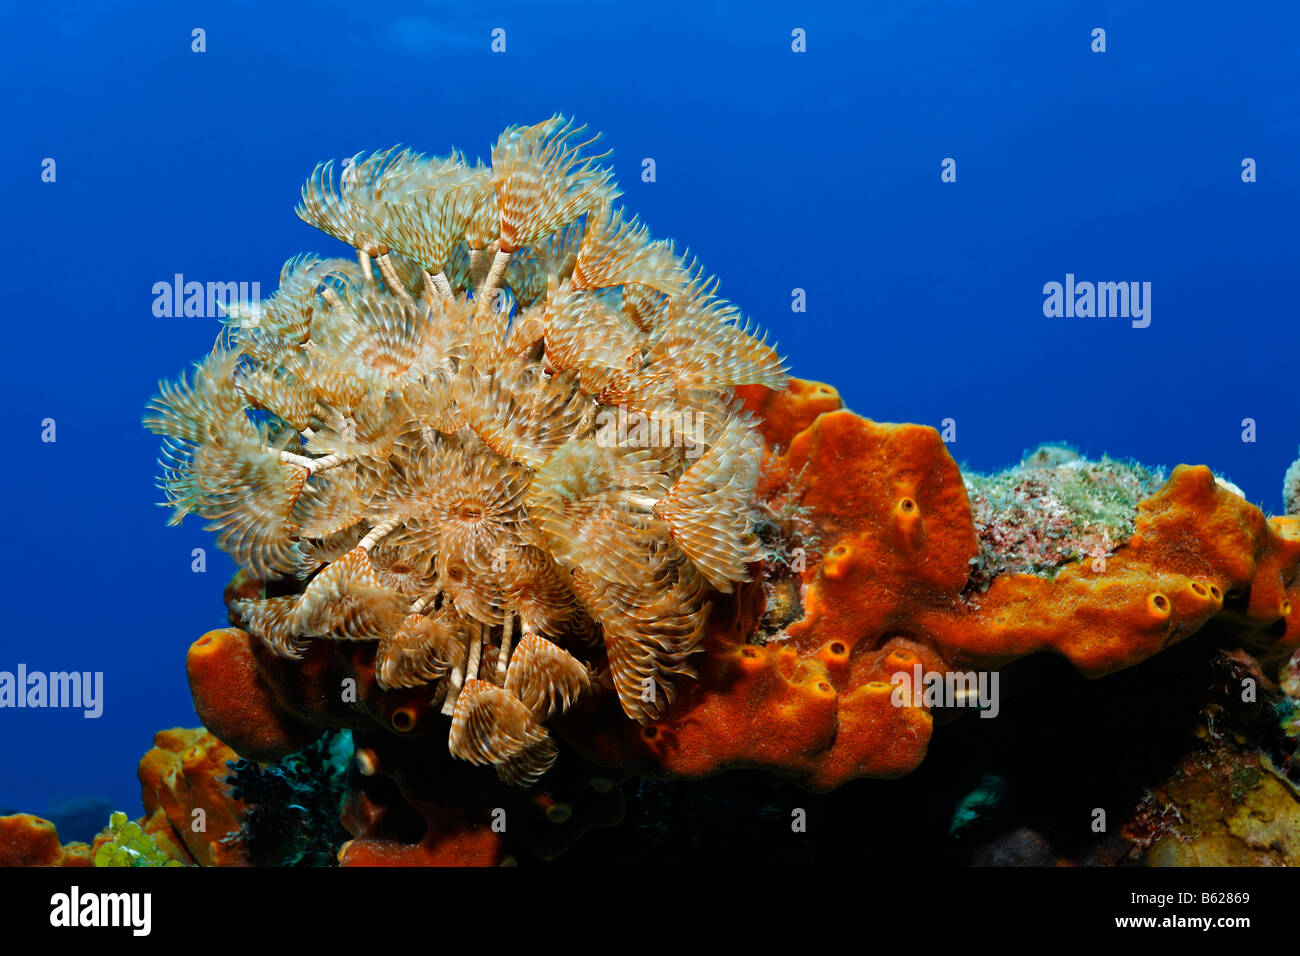 Cluster Duster (Bispira brunnea), tubeworm, sobre una esponja (marrón Ectoplasia ferox) delante de agua azul, Turneffe Atoll, Belice Foto de stock